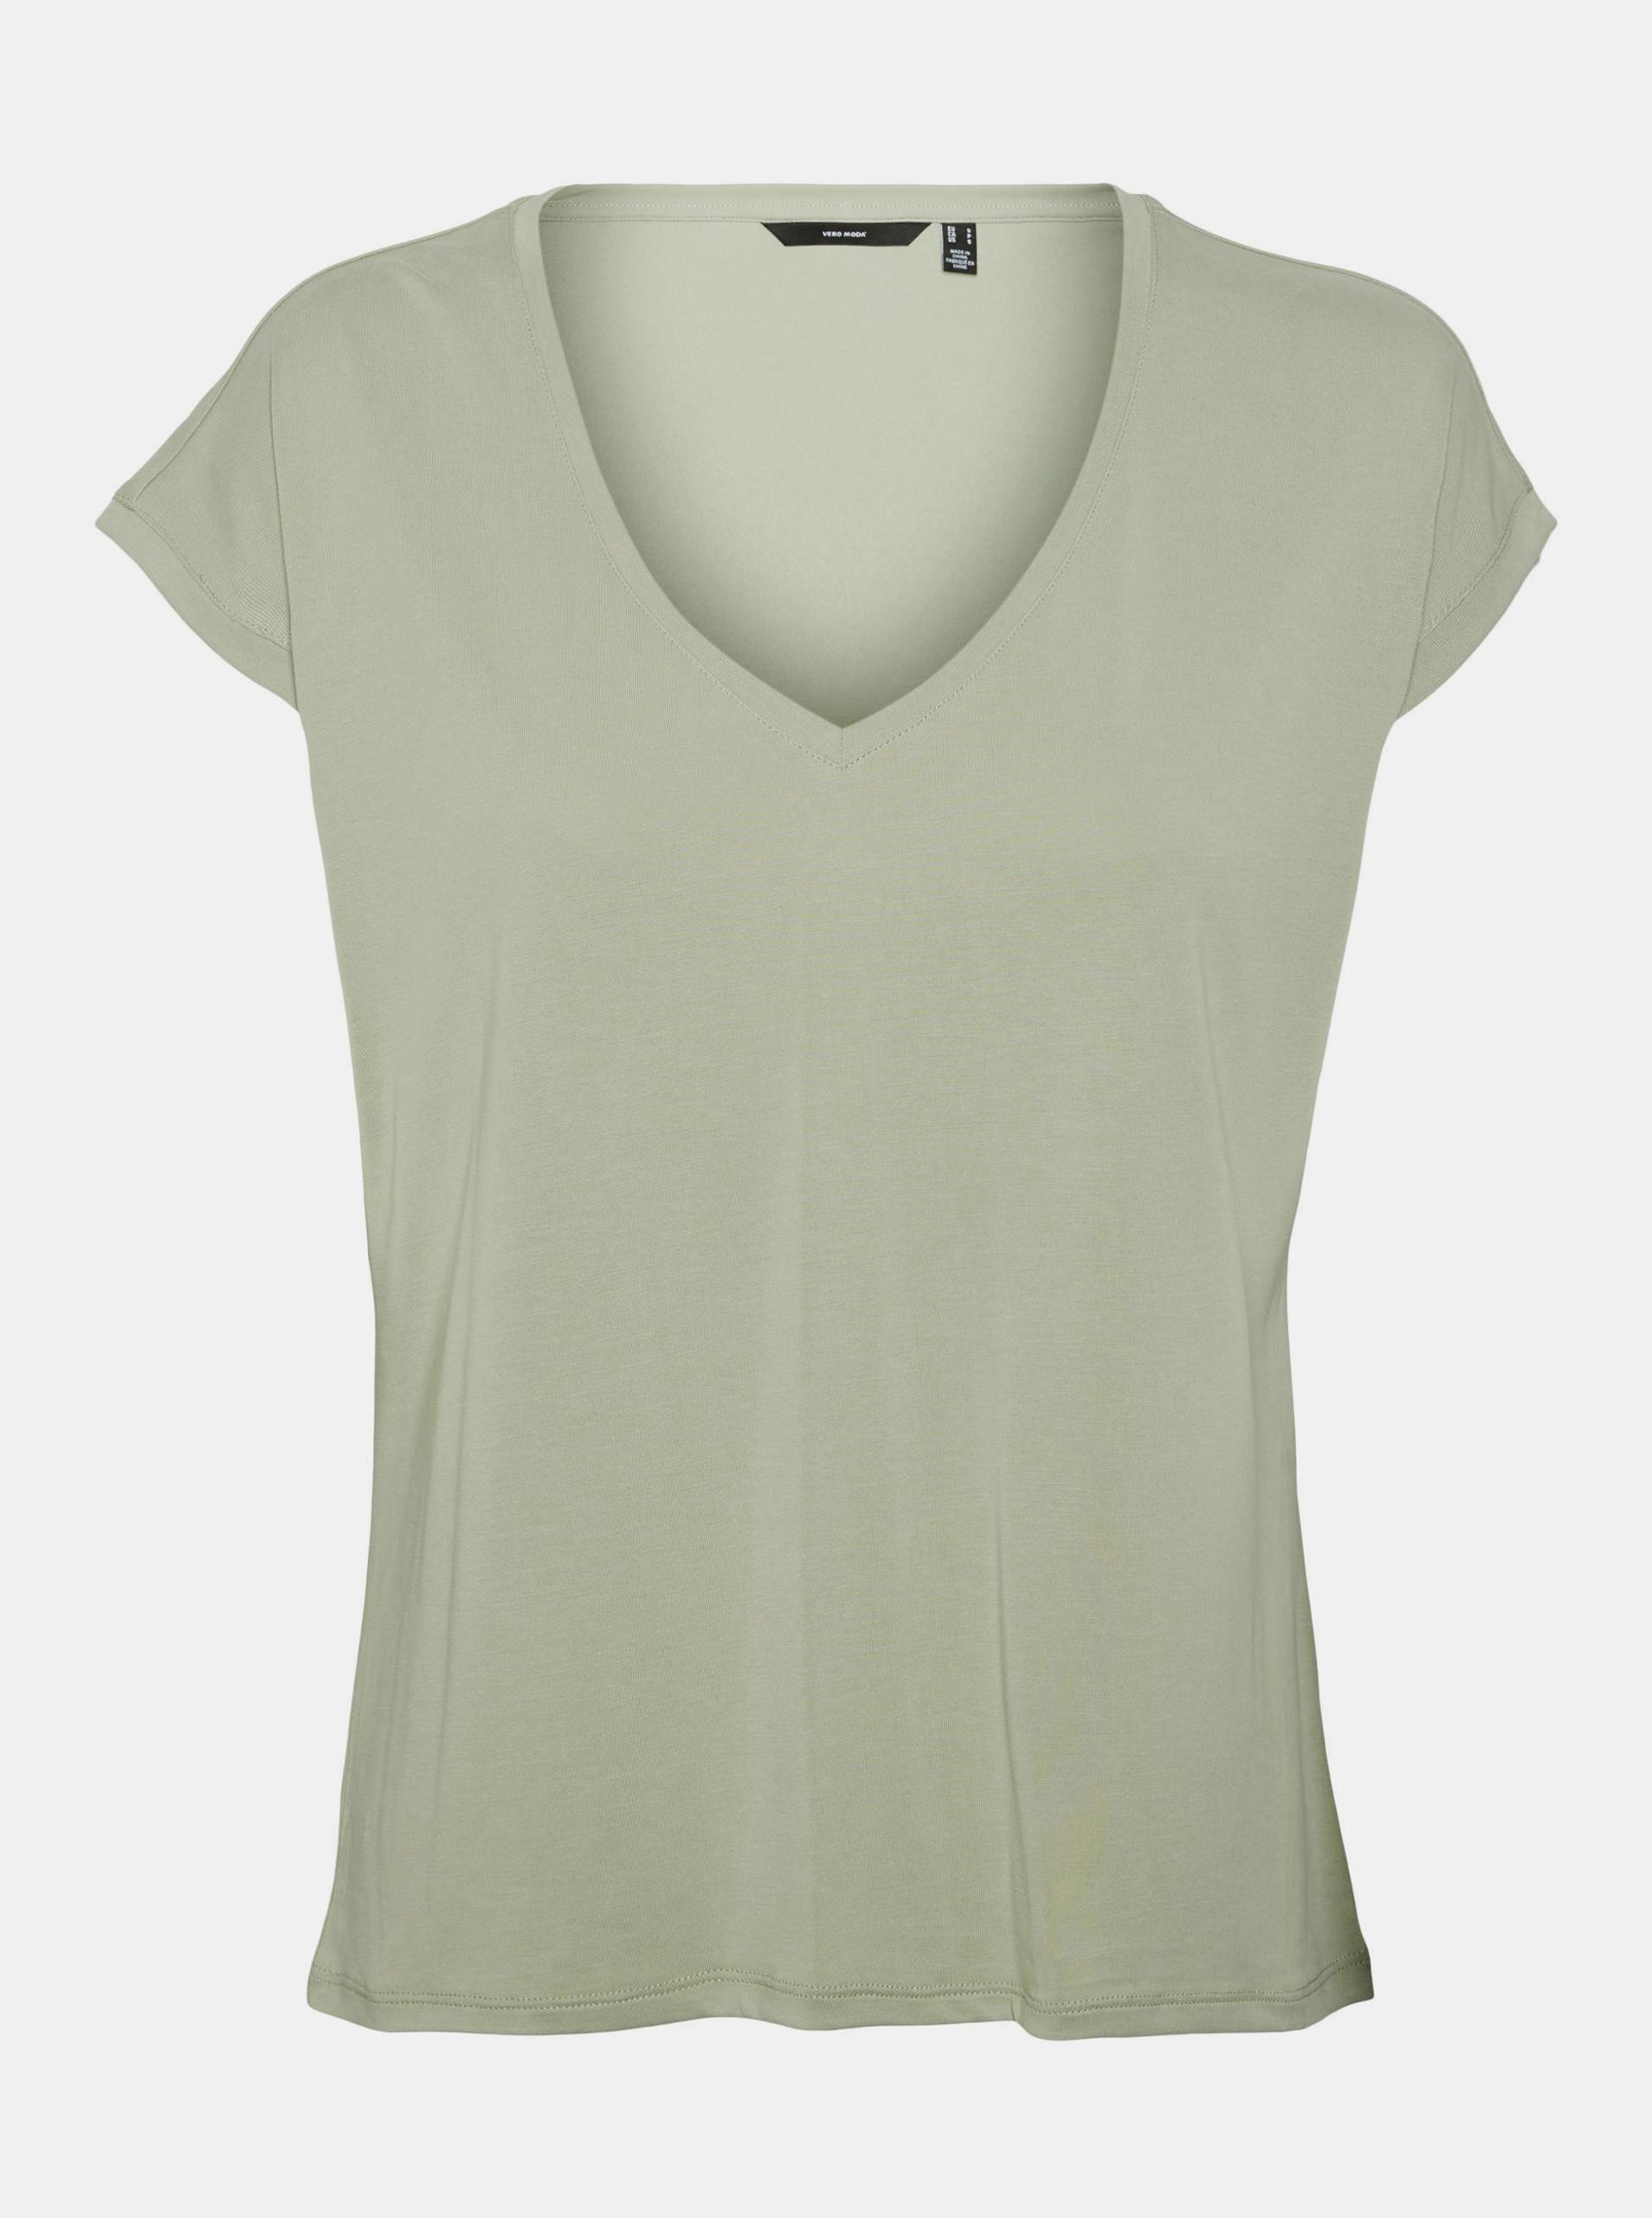 Vero Moda verzi tricou Filli